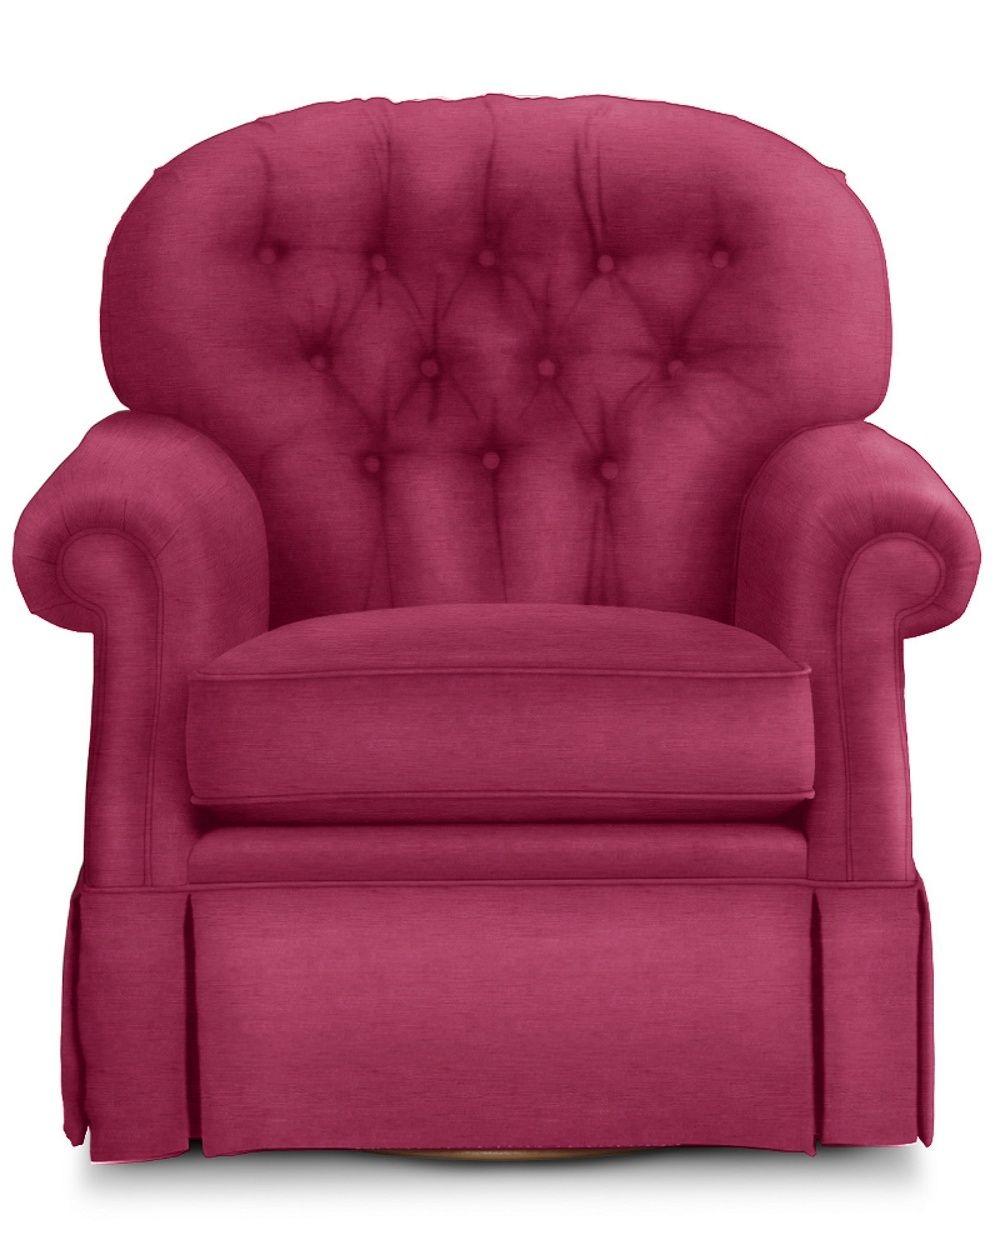 Swivel Glider Rocker Chair